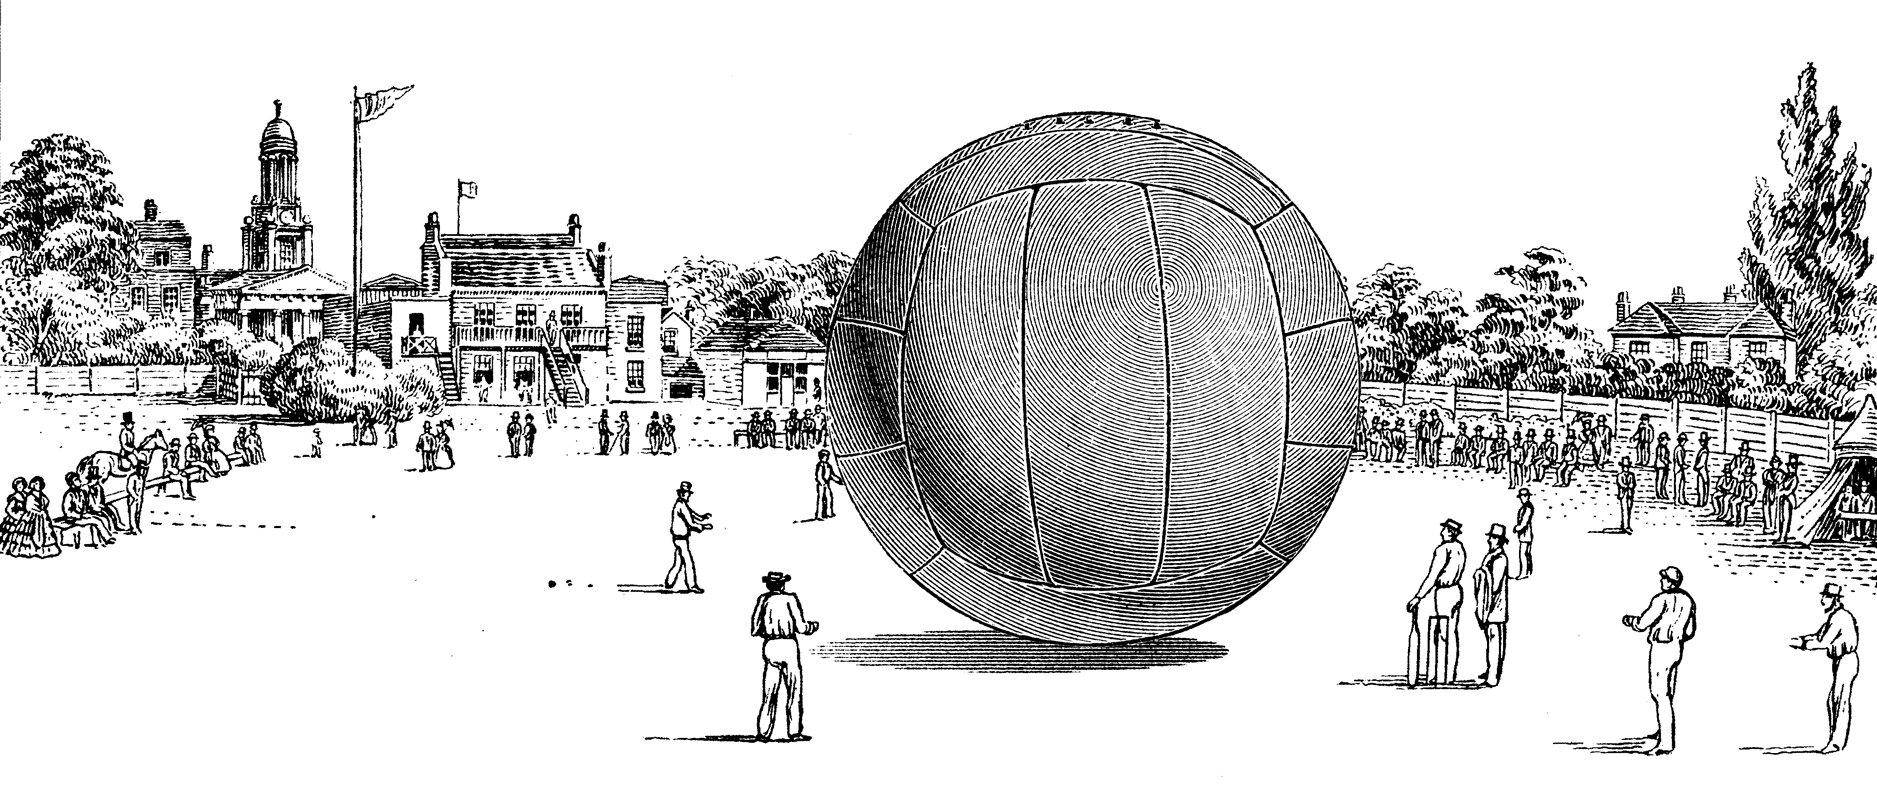 munchhausen-football.jpg